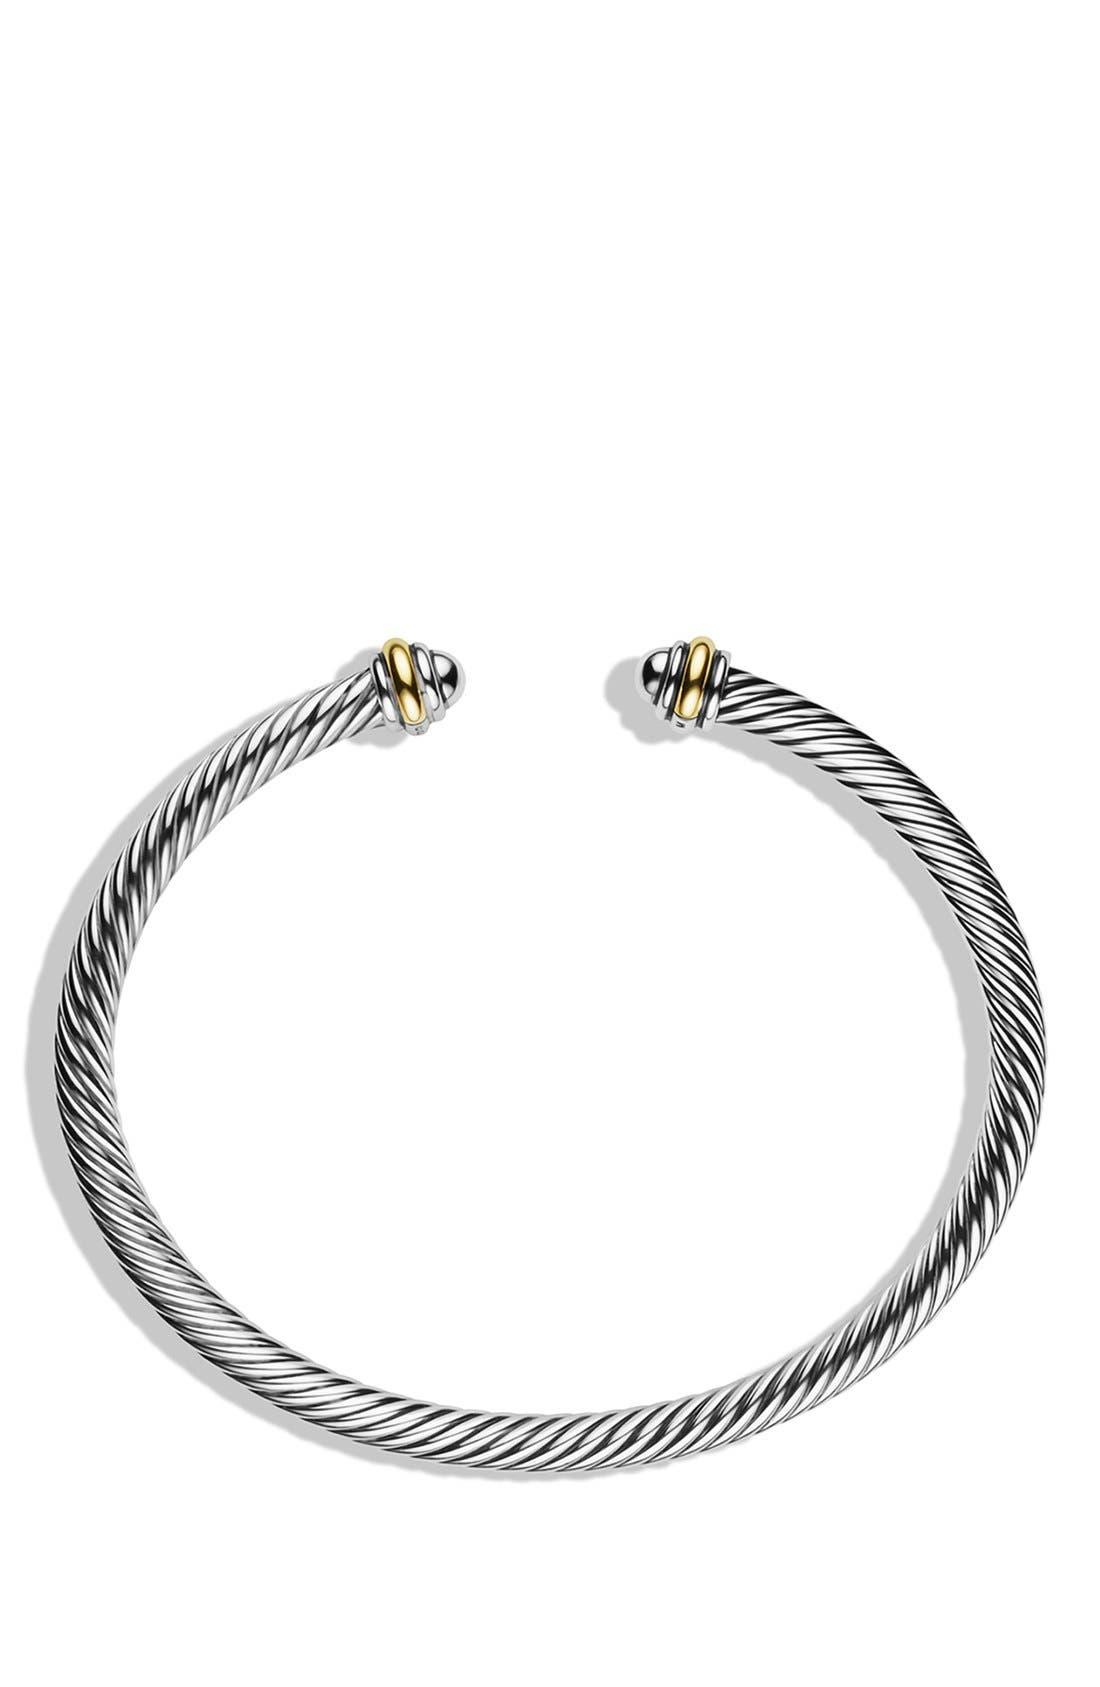 DAVID YURMAN, Cable Classics Bracelet with 18K Gold, 4mm, Alternate thumbnail 3, color, TWO TONE